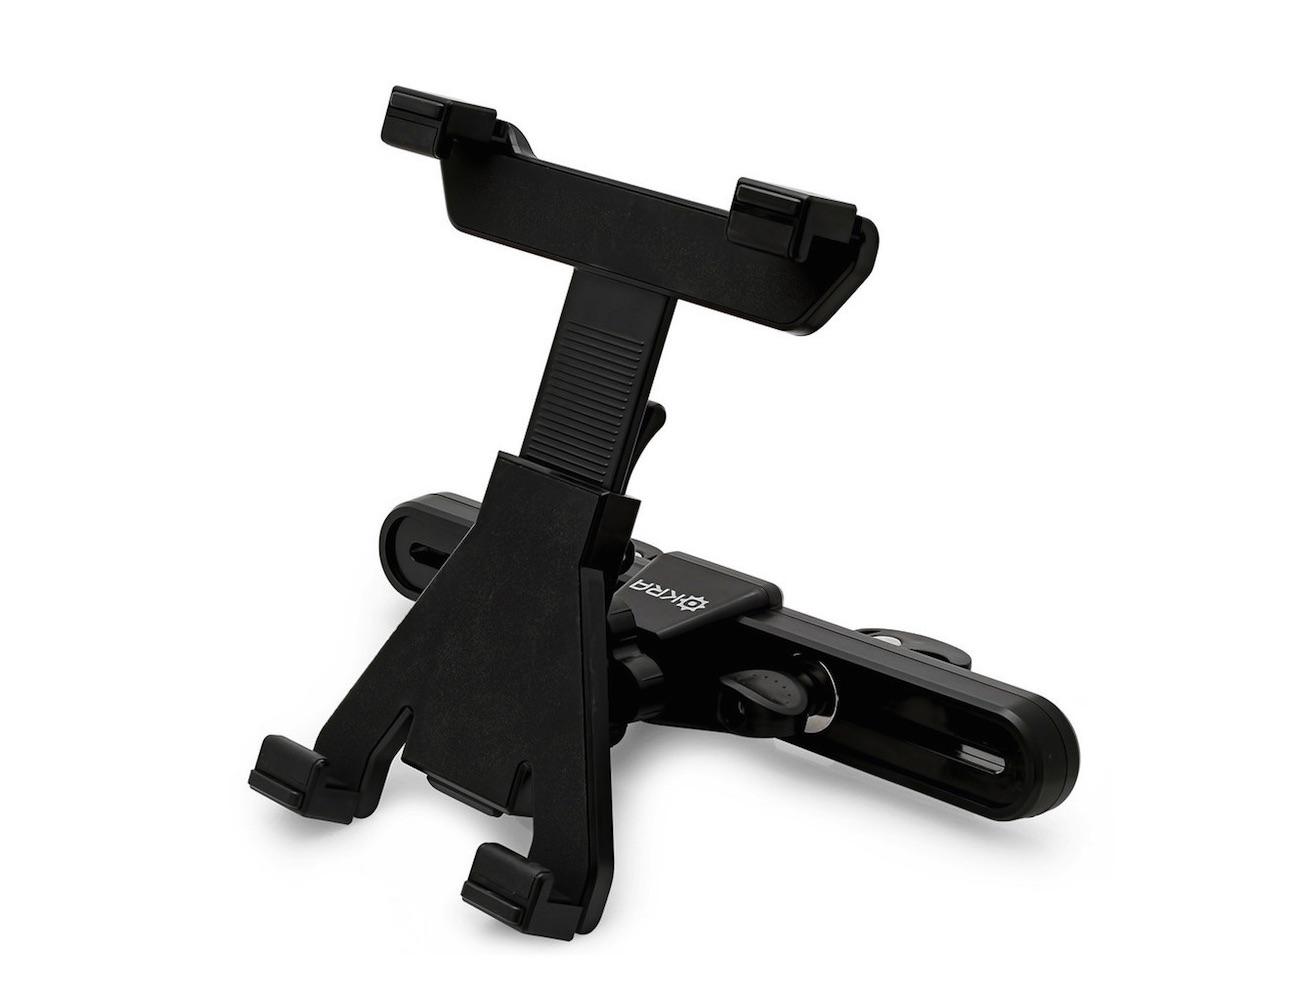 Okra® 360° Degree Adjustable Rotating Headrest Car Seat Mount Holder